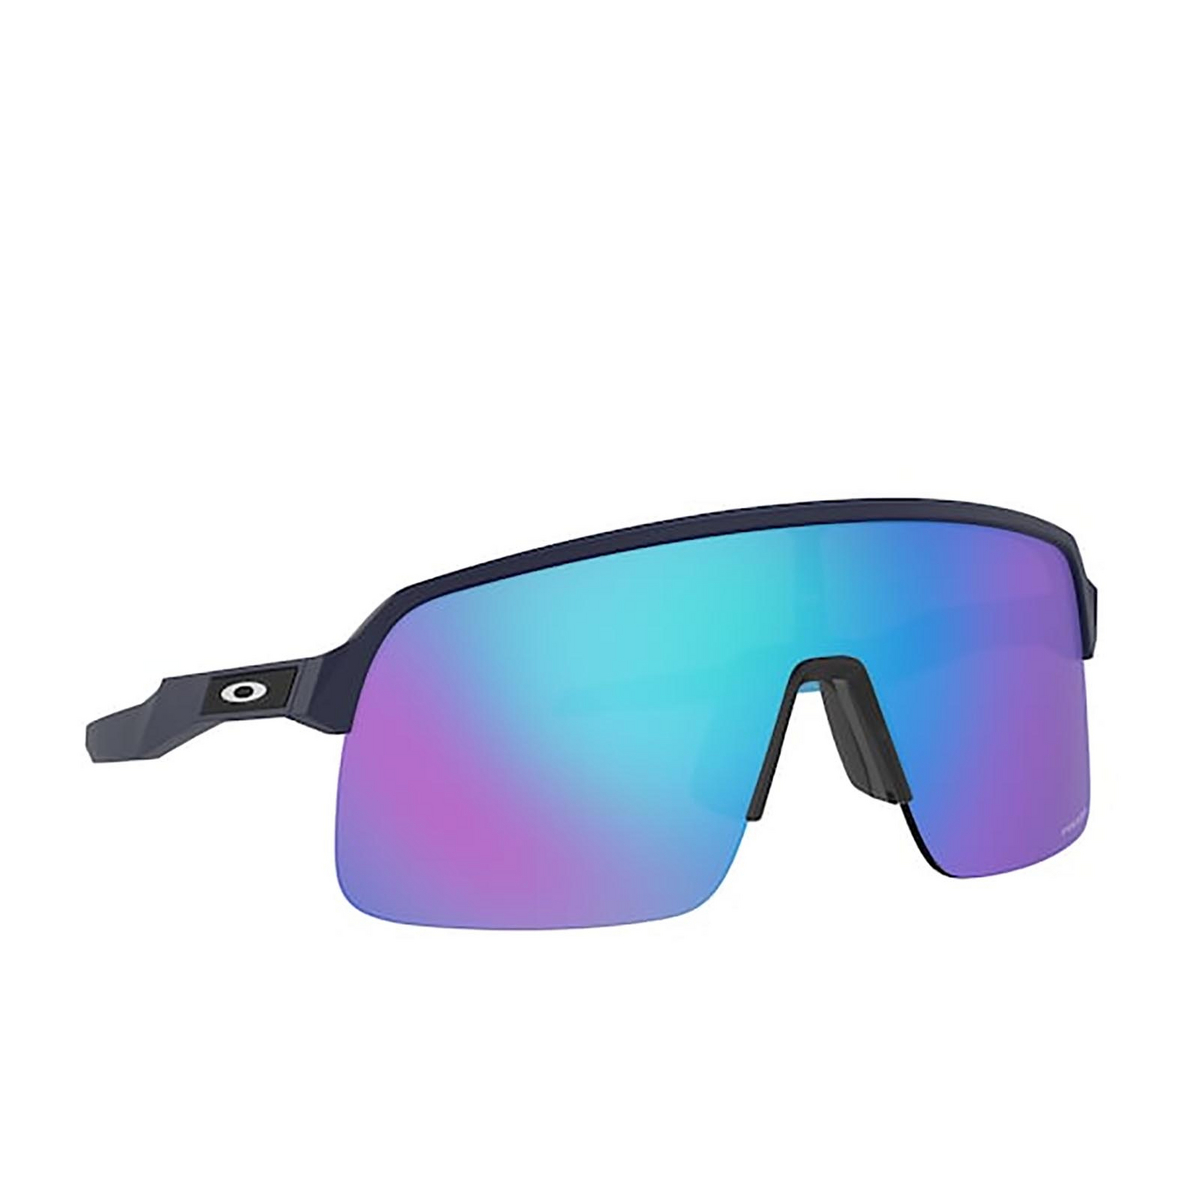 Oakley® Mask Sunglasses: Sutro Lite OO9463 color Matte Navy 946306 - three-quarters view.